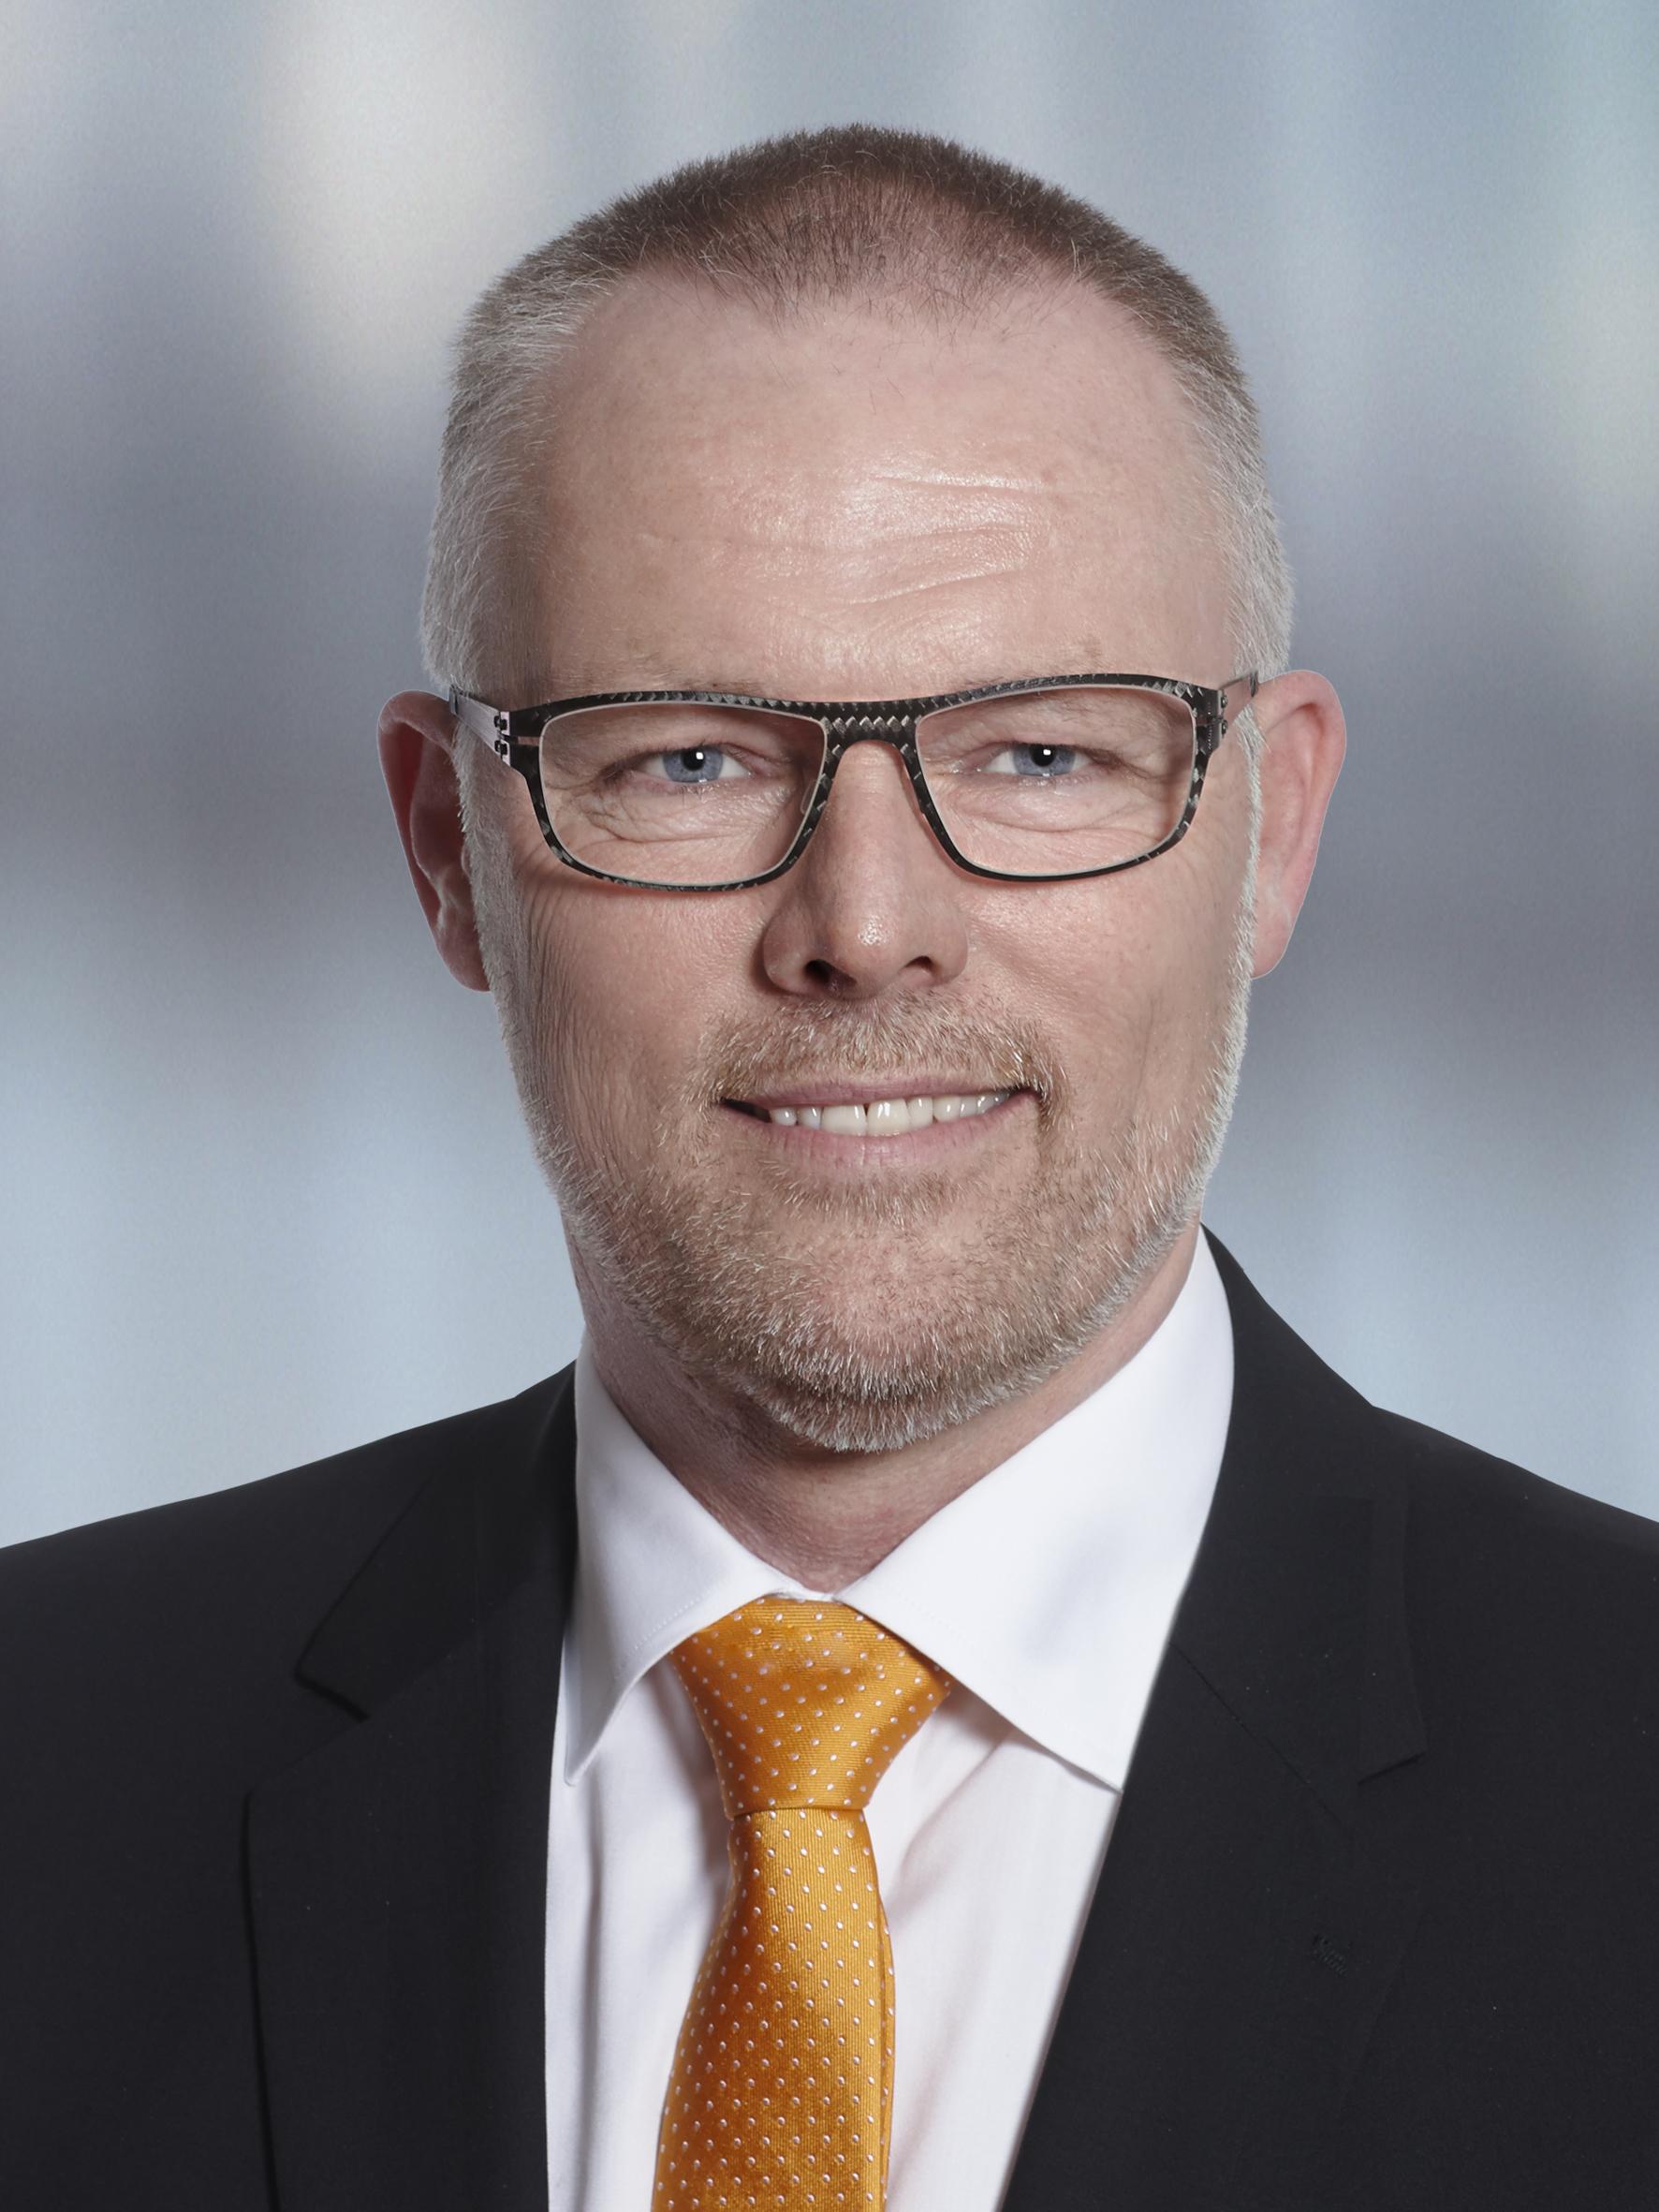 KOMMUNALDIREKTØR ER FRATRÅDT – PRIS 2.2 MIO KRONER